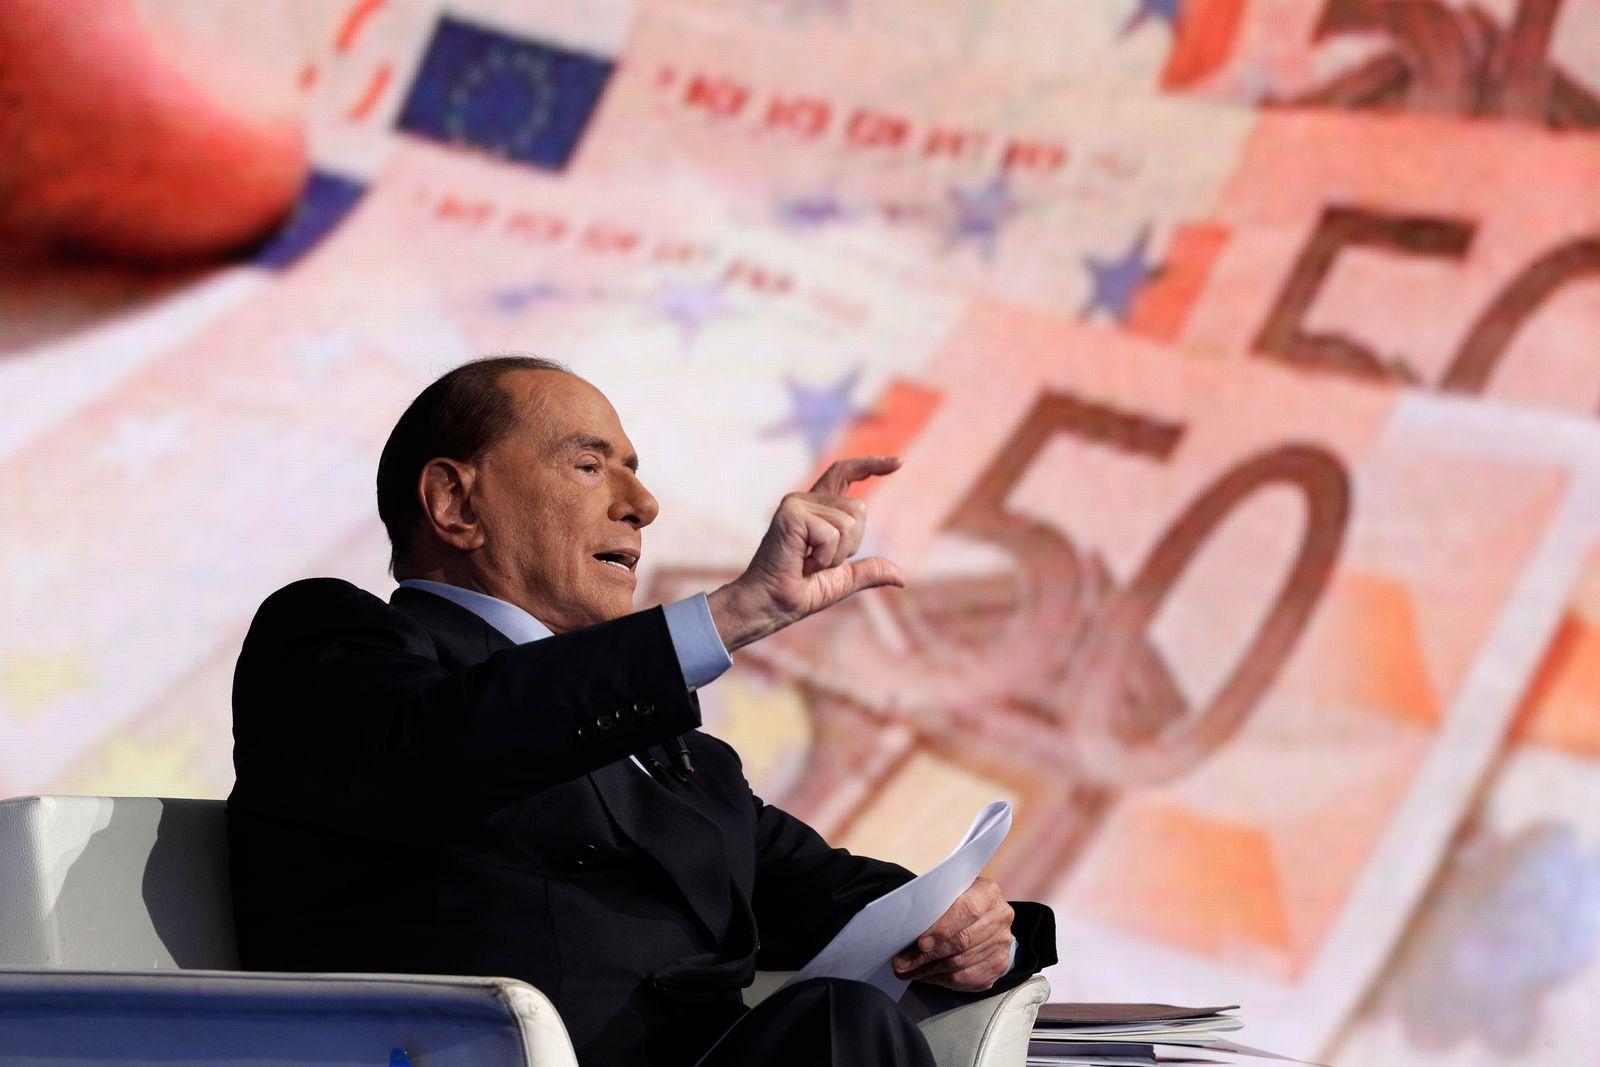 Italien / Finanzkrise / Euro / Berlusconi